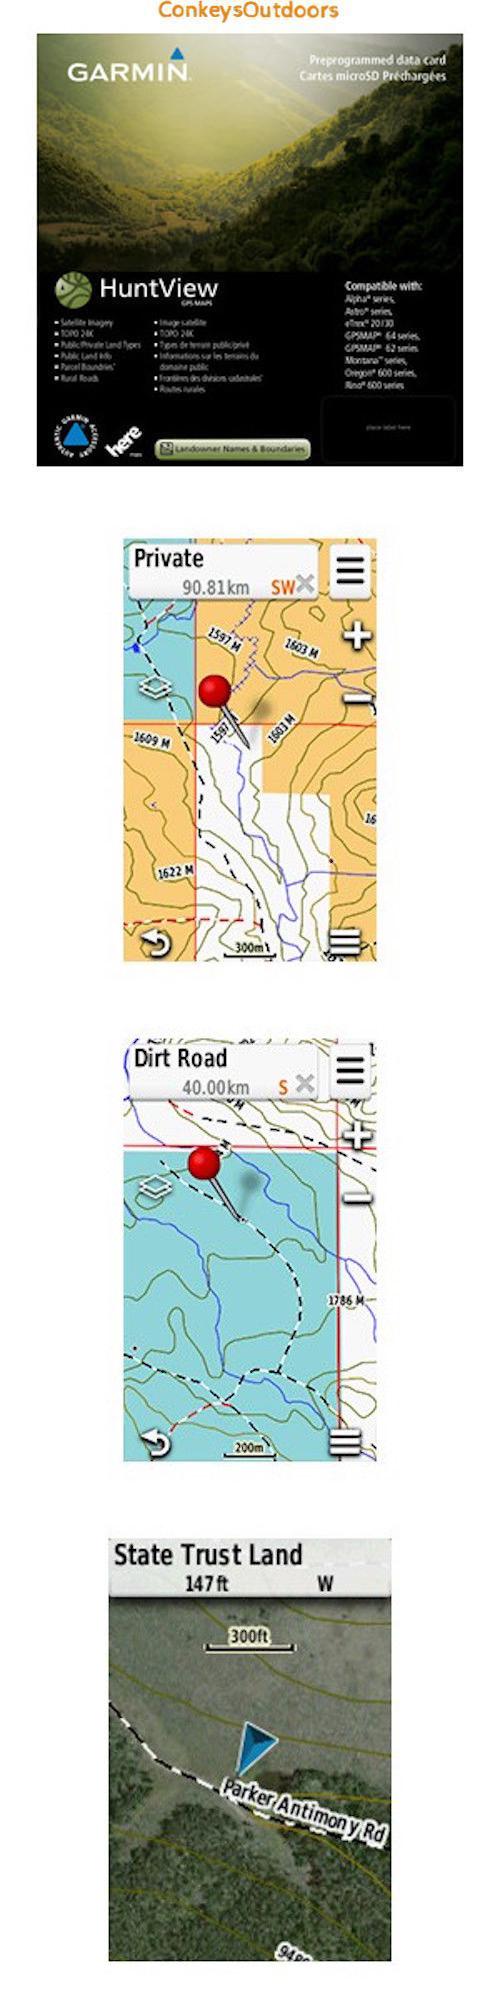 GPS Software And Maps Garmin Pennsylvania Hunt View State - Buy Us Topo24k Garmin Maps